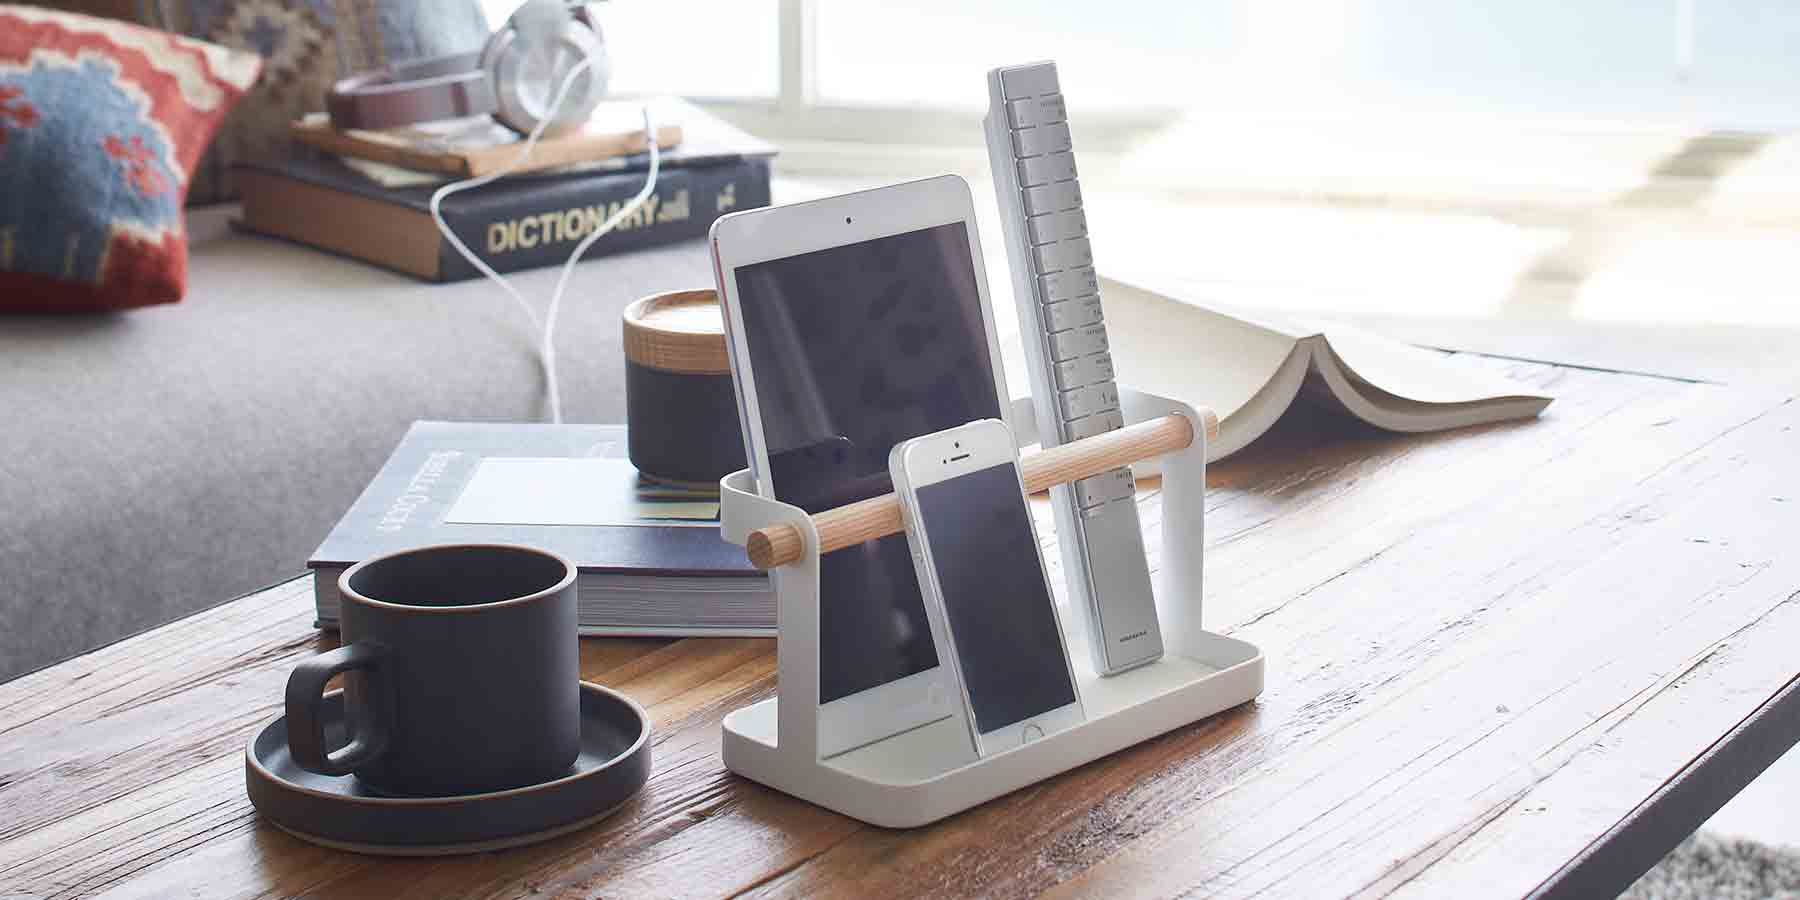 iPadスタンド iPad mini タブレット スタンド リモコン 収納 リモコンホルダー タブレット&リモコンラック トスカ tosca